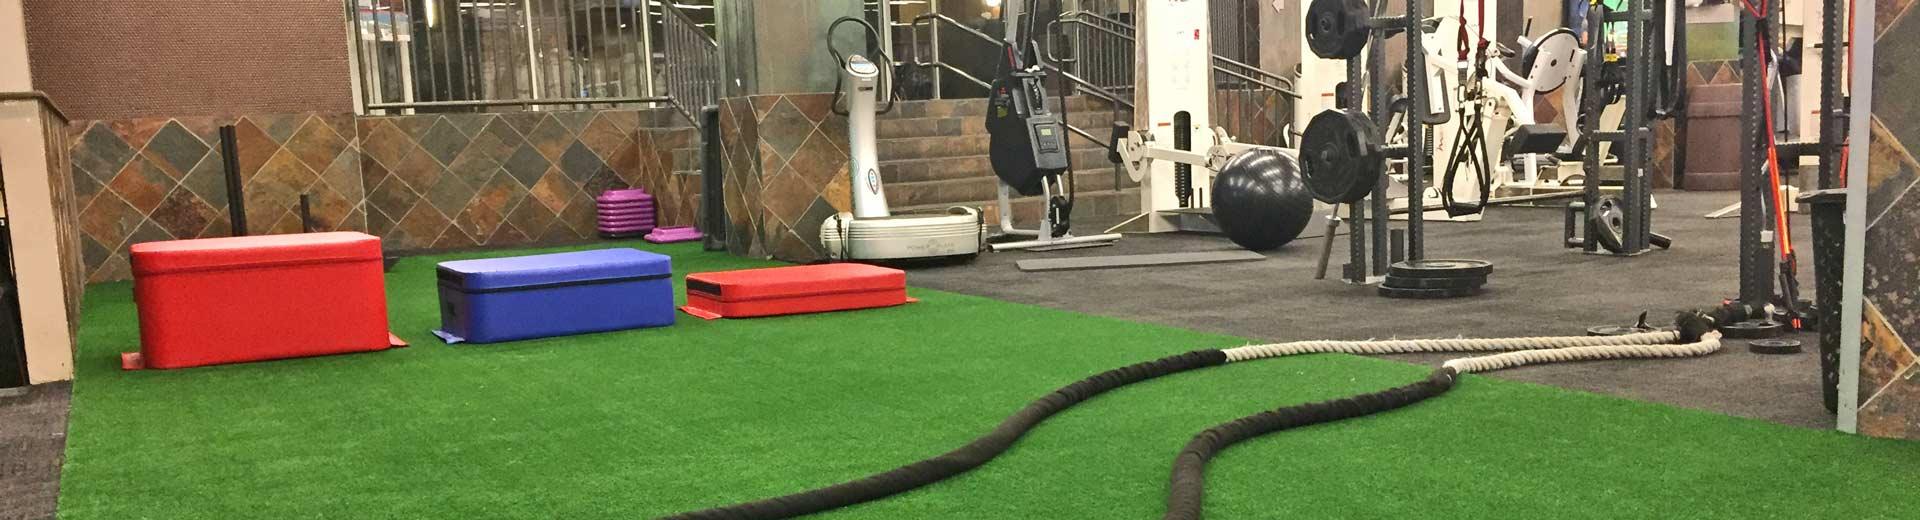 garden city  new york gym amenities